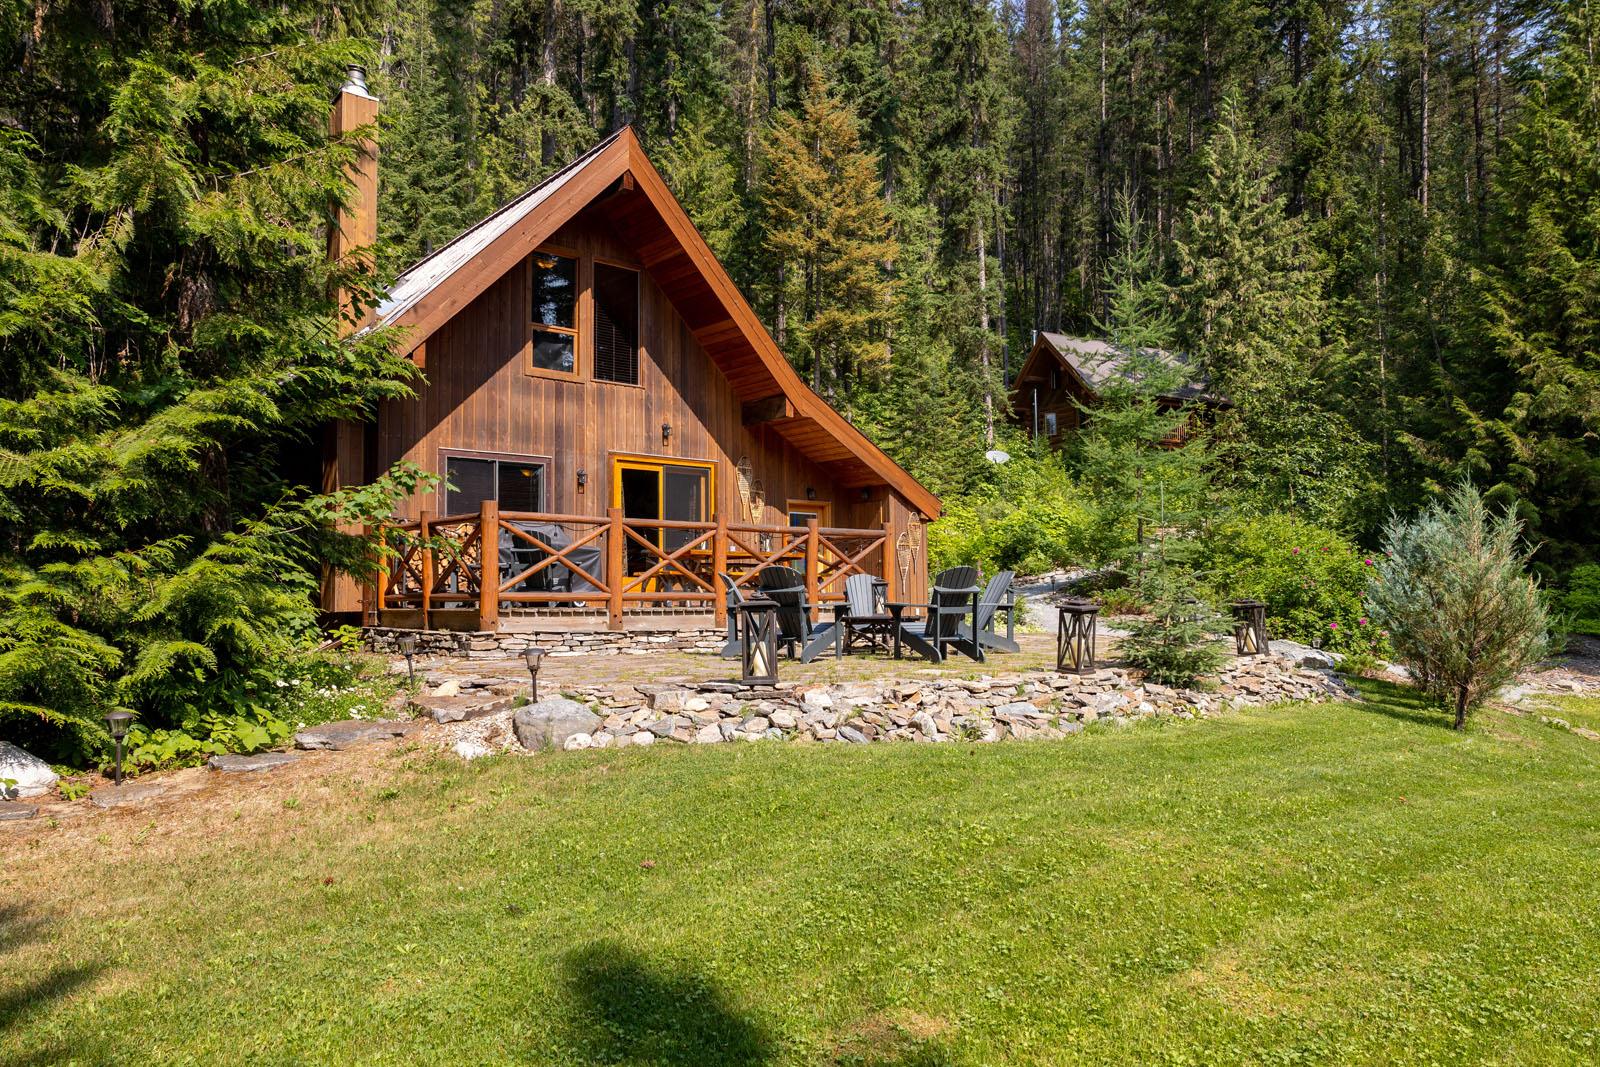 Mount robson log home 01